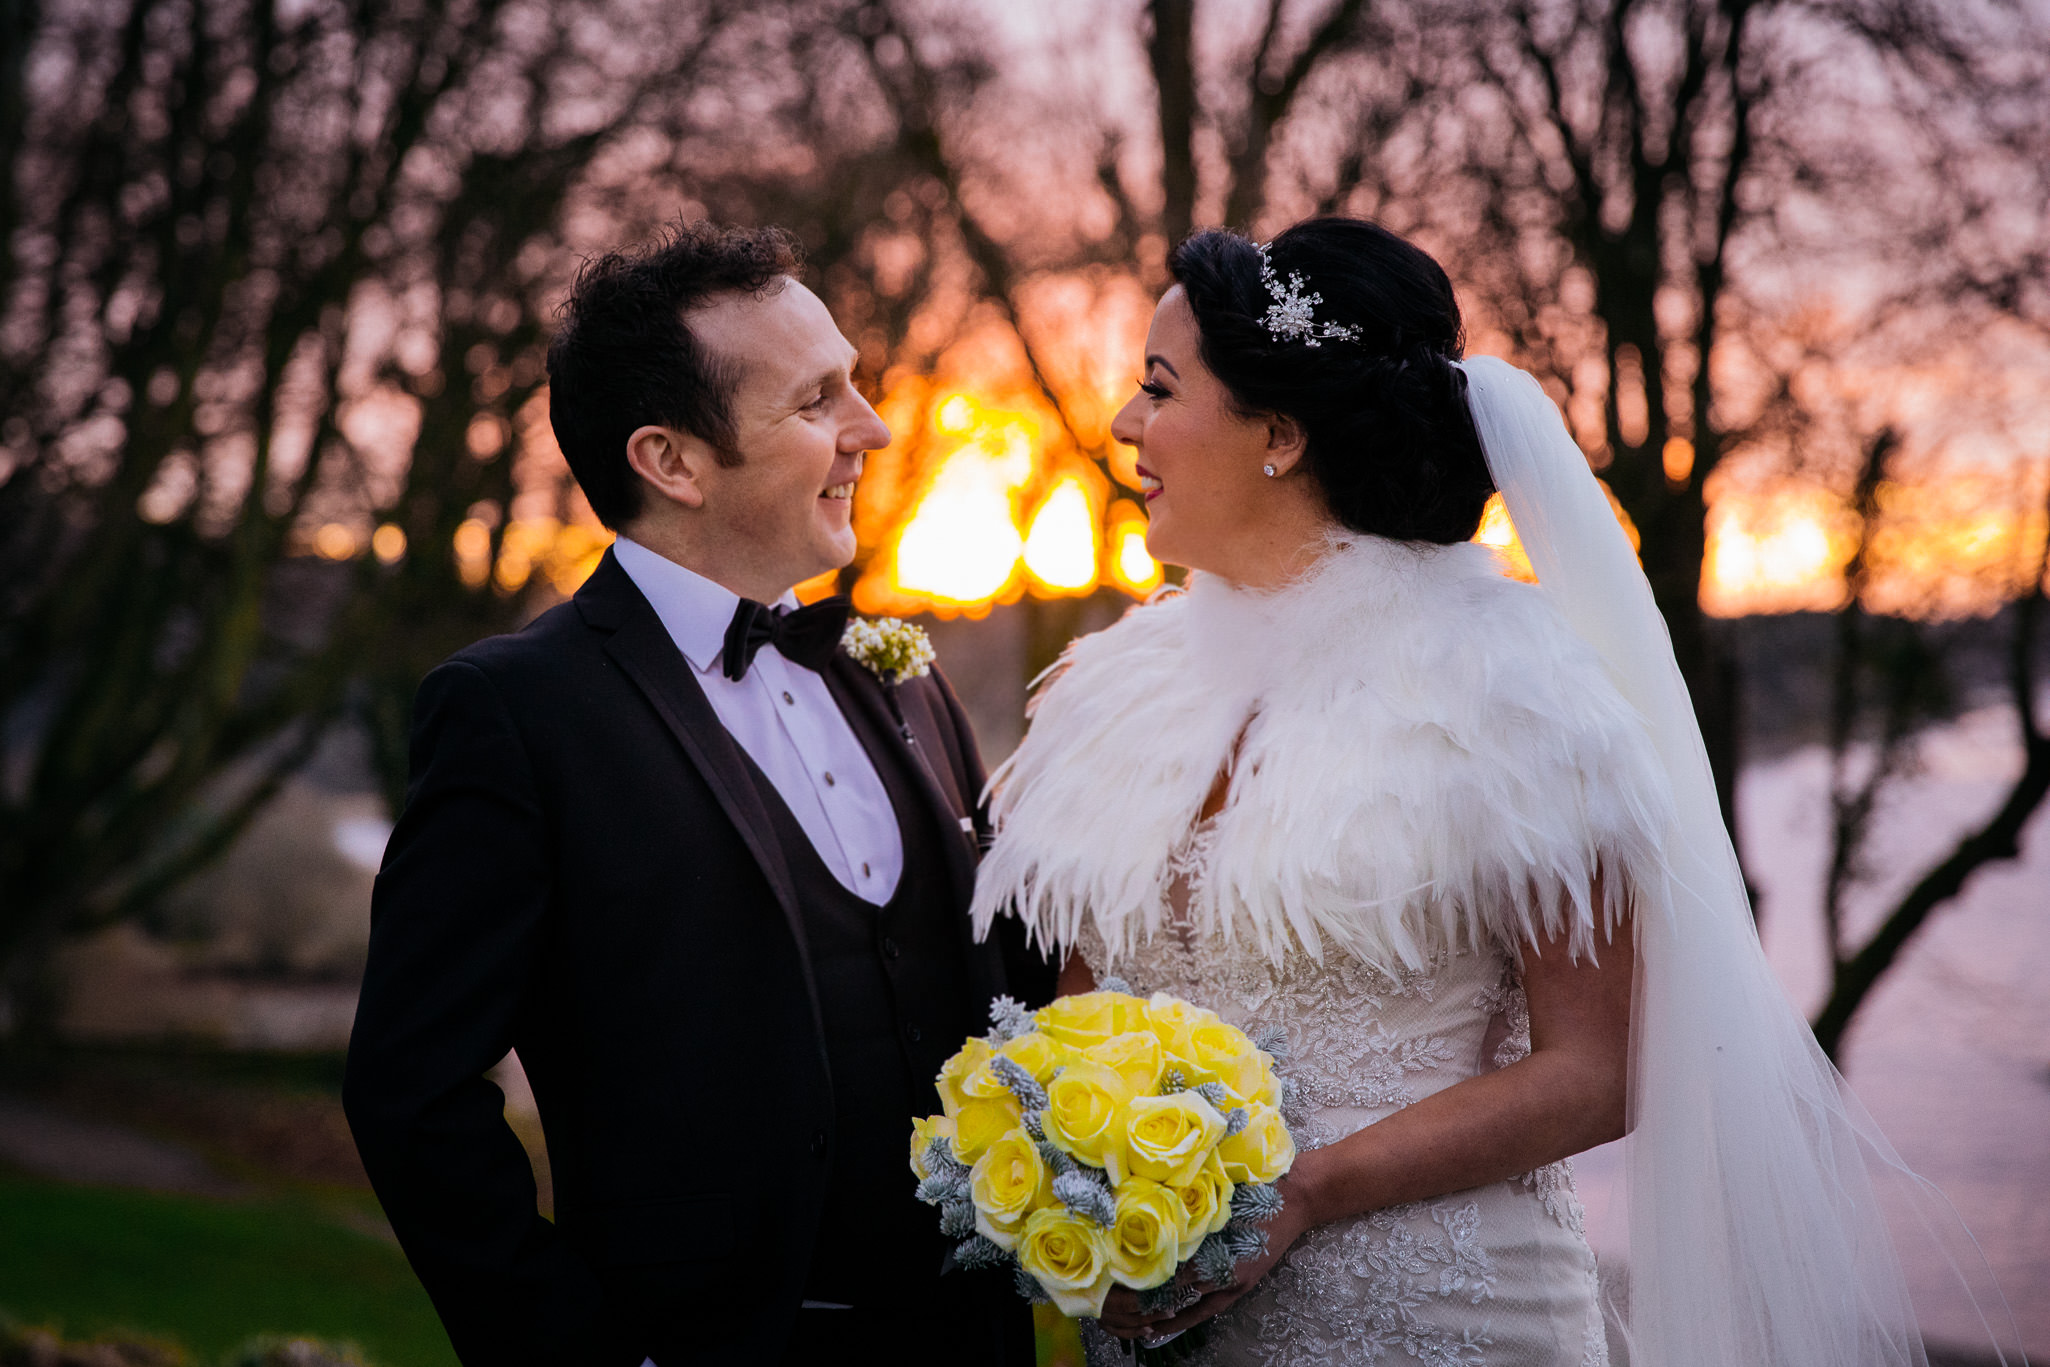 clairebyrnephotography-wedding-sparklers-christmas-orlagh-daithi-11.jpg